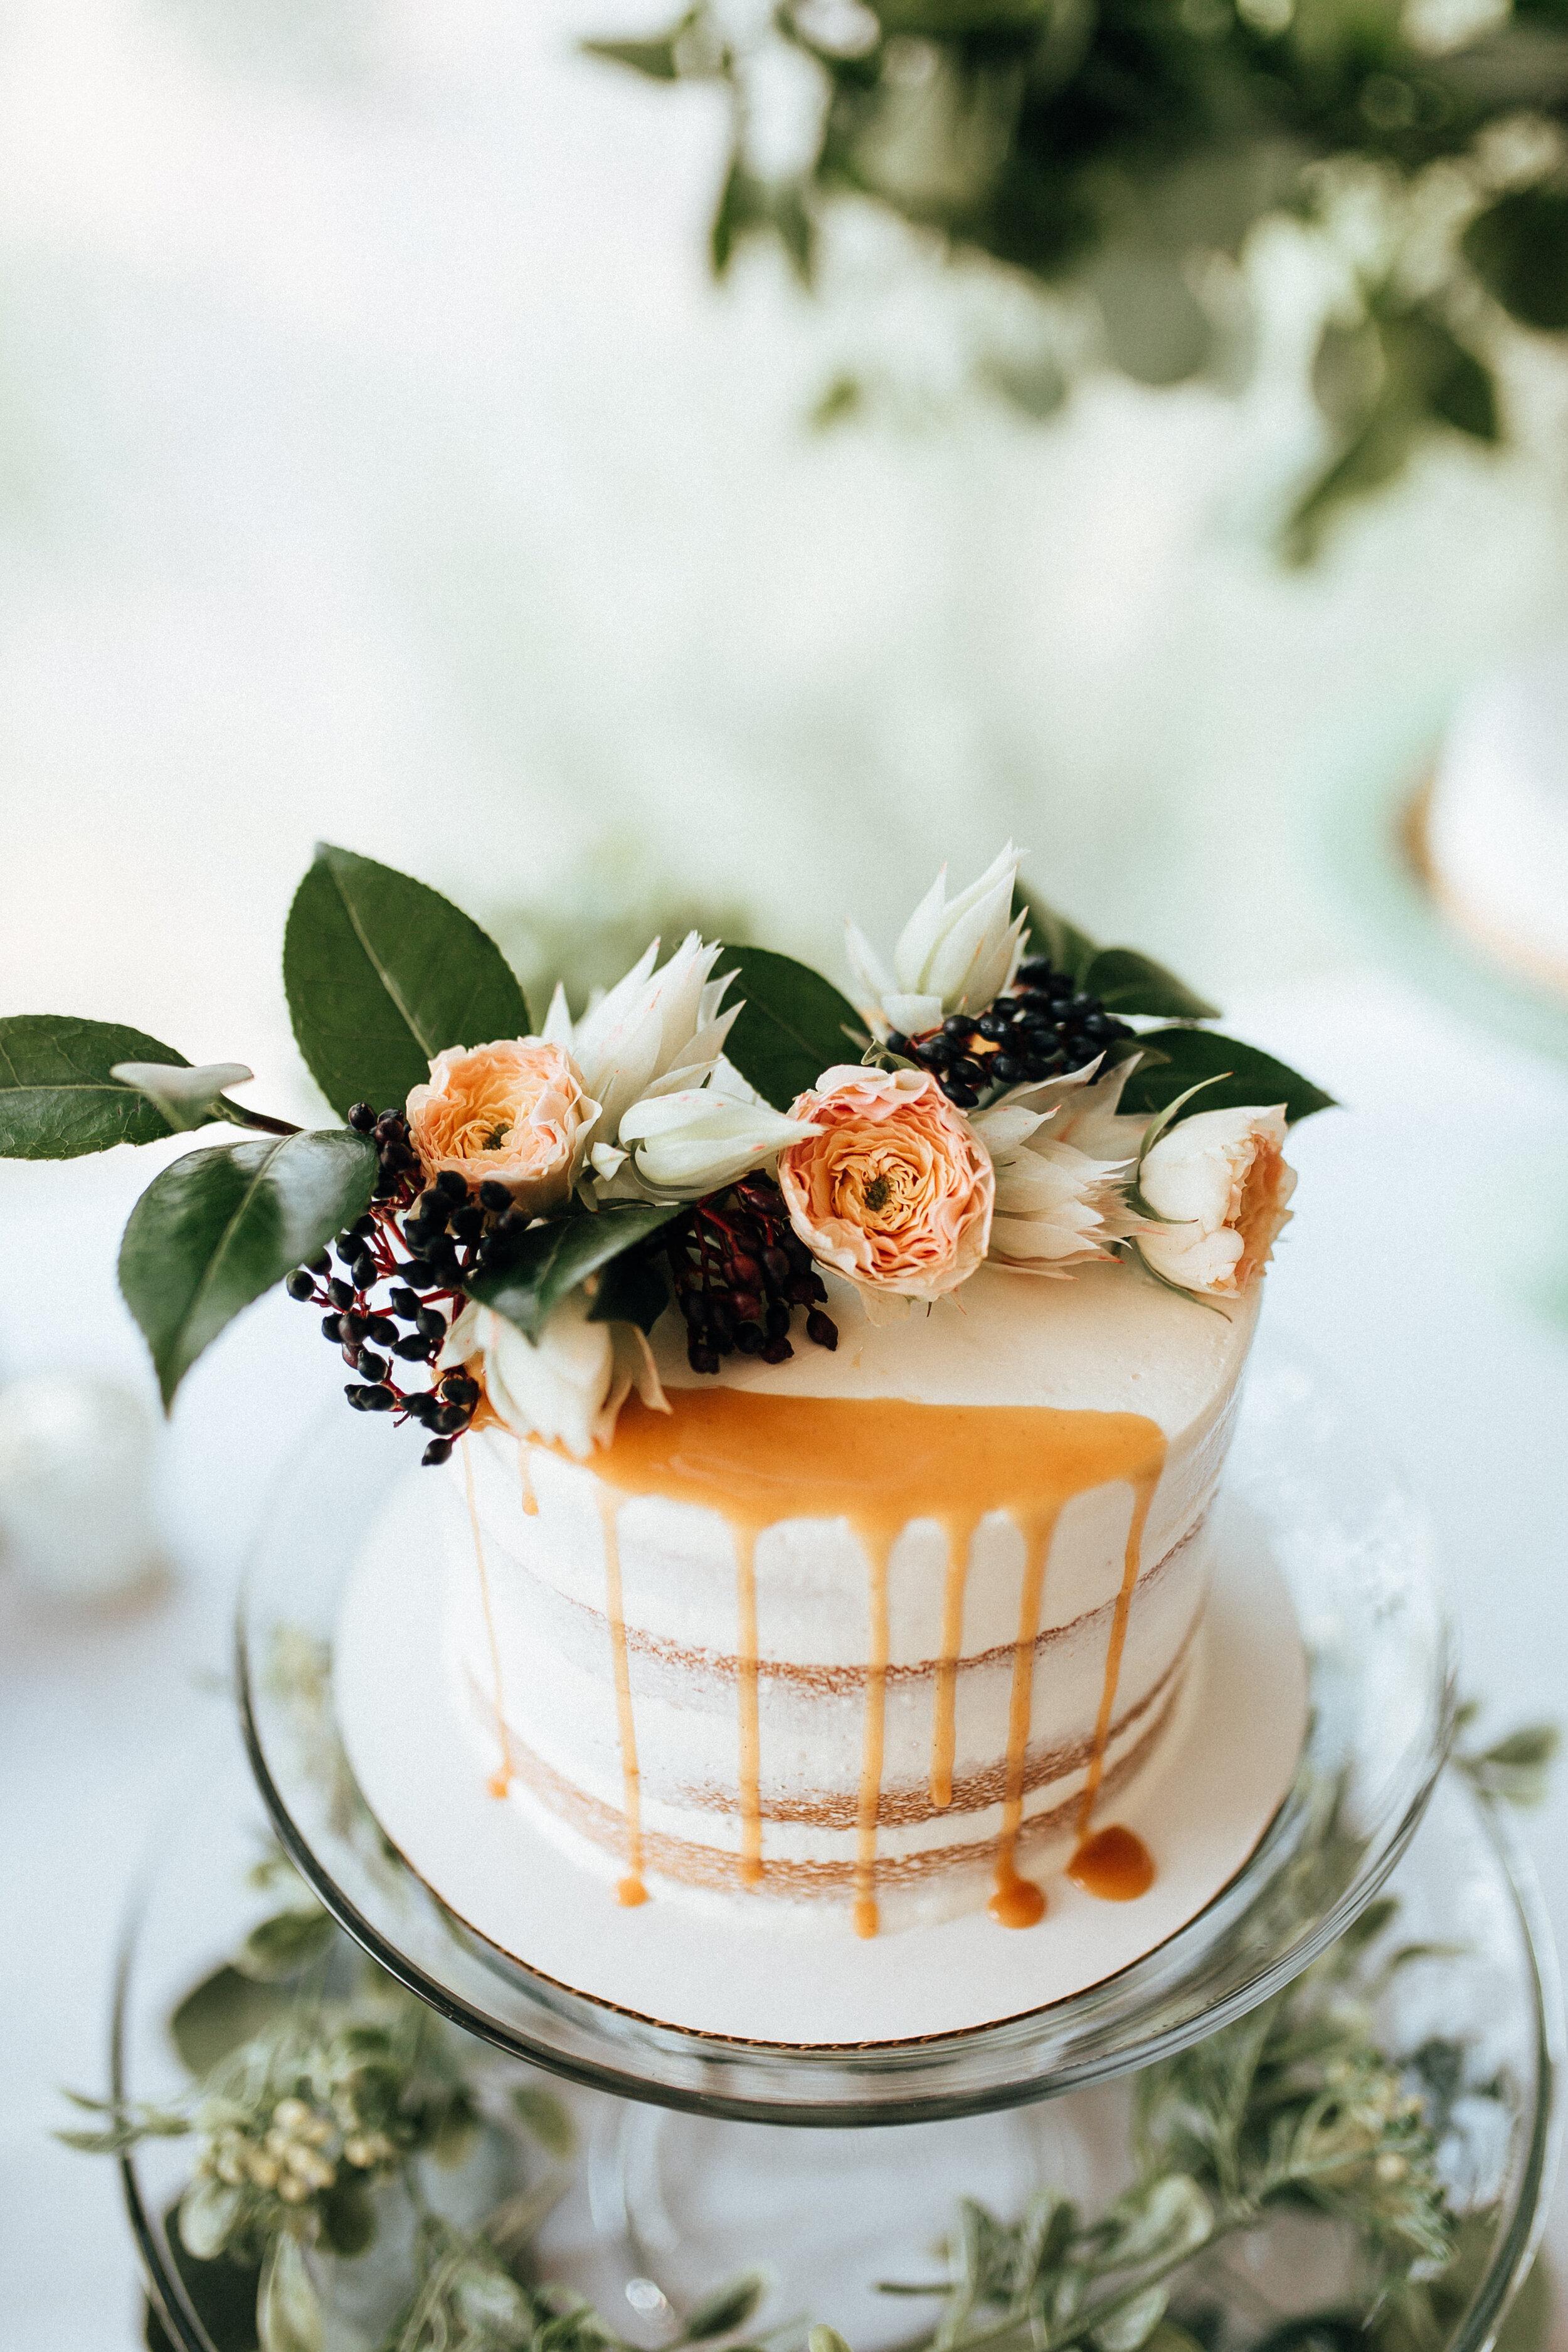 Scratch made wedding cakes